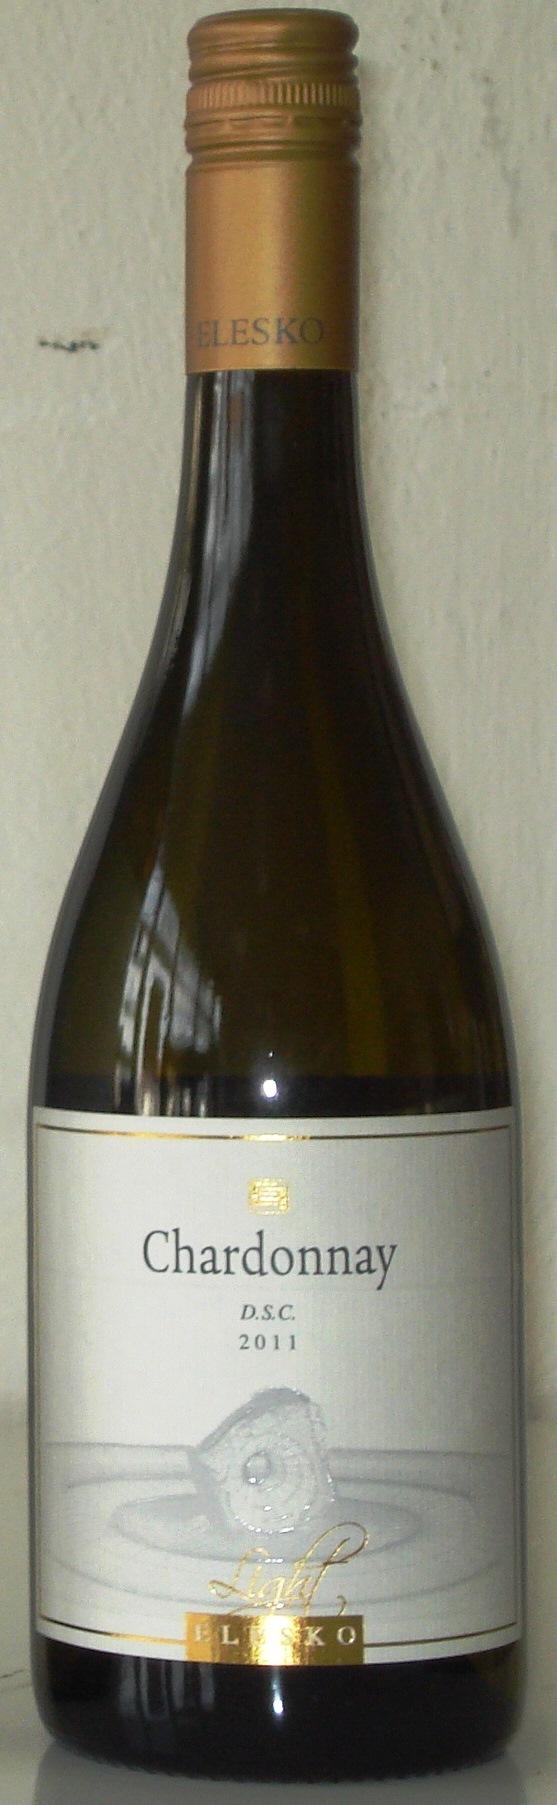 Chardonnay light Elesko 2011 sladké